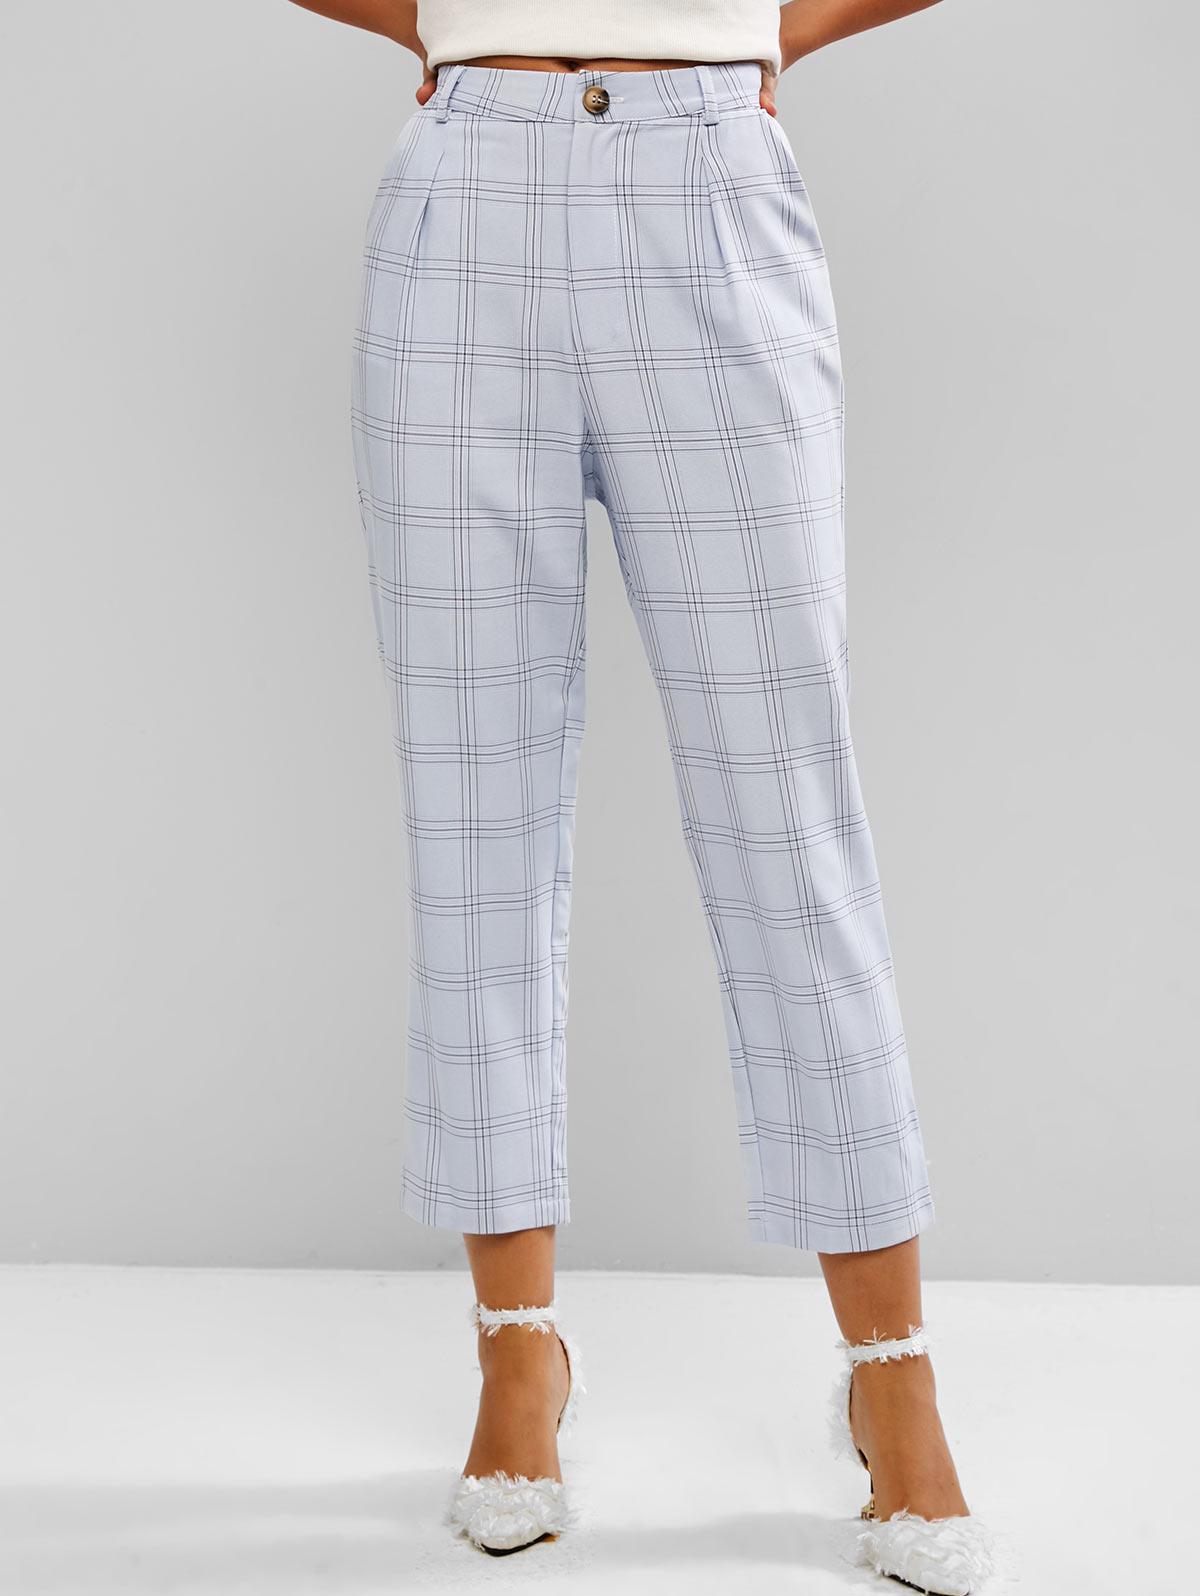 Pantalon Fuselé à Carreaux à Taille Haute - ZAFUL - Modalova